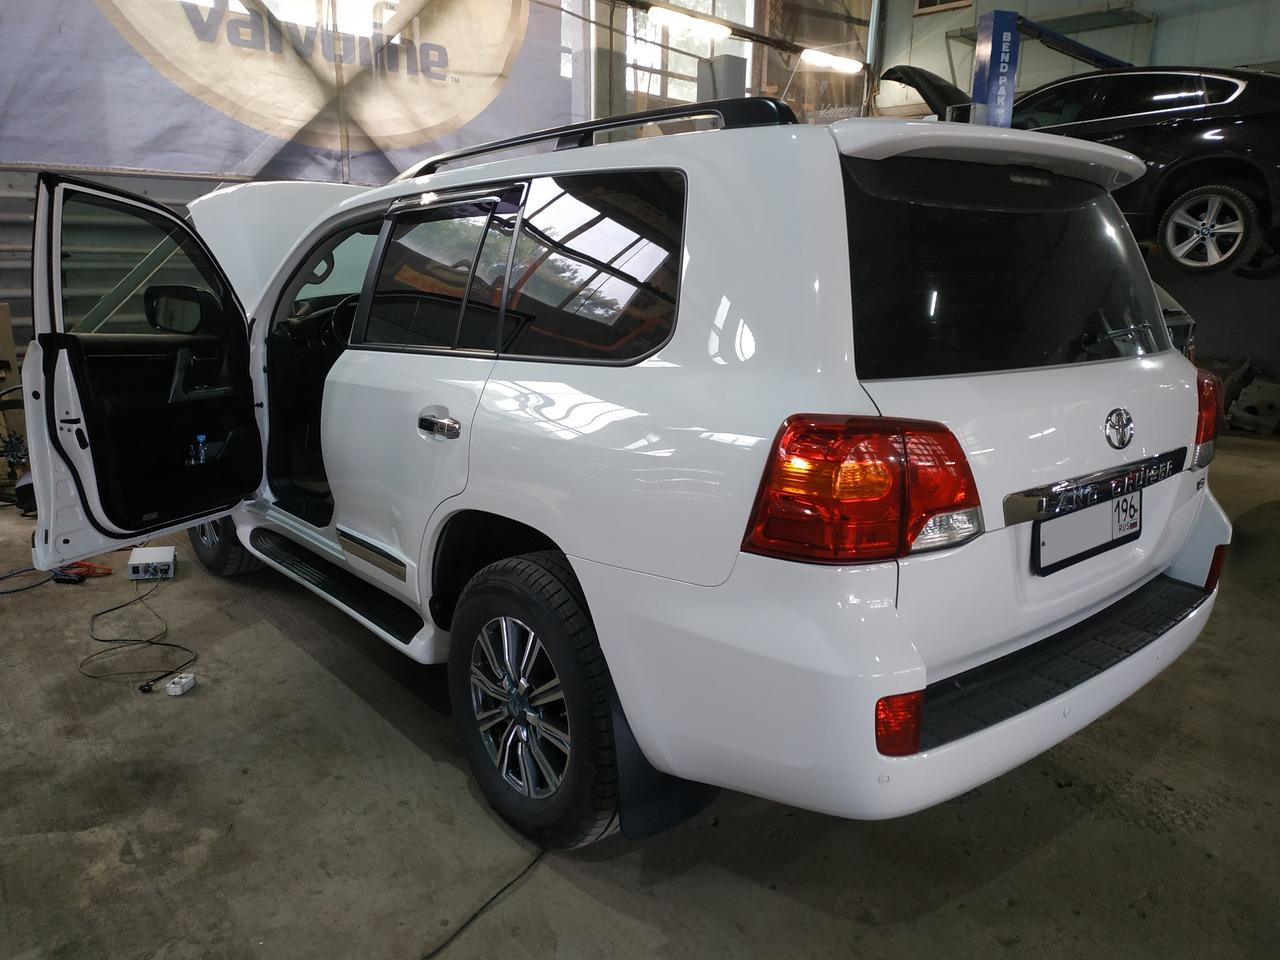 Toyota Land Cruiser 200, 2014 г.в.